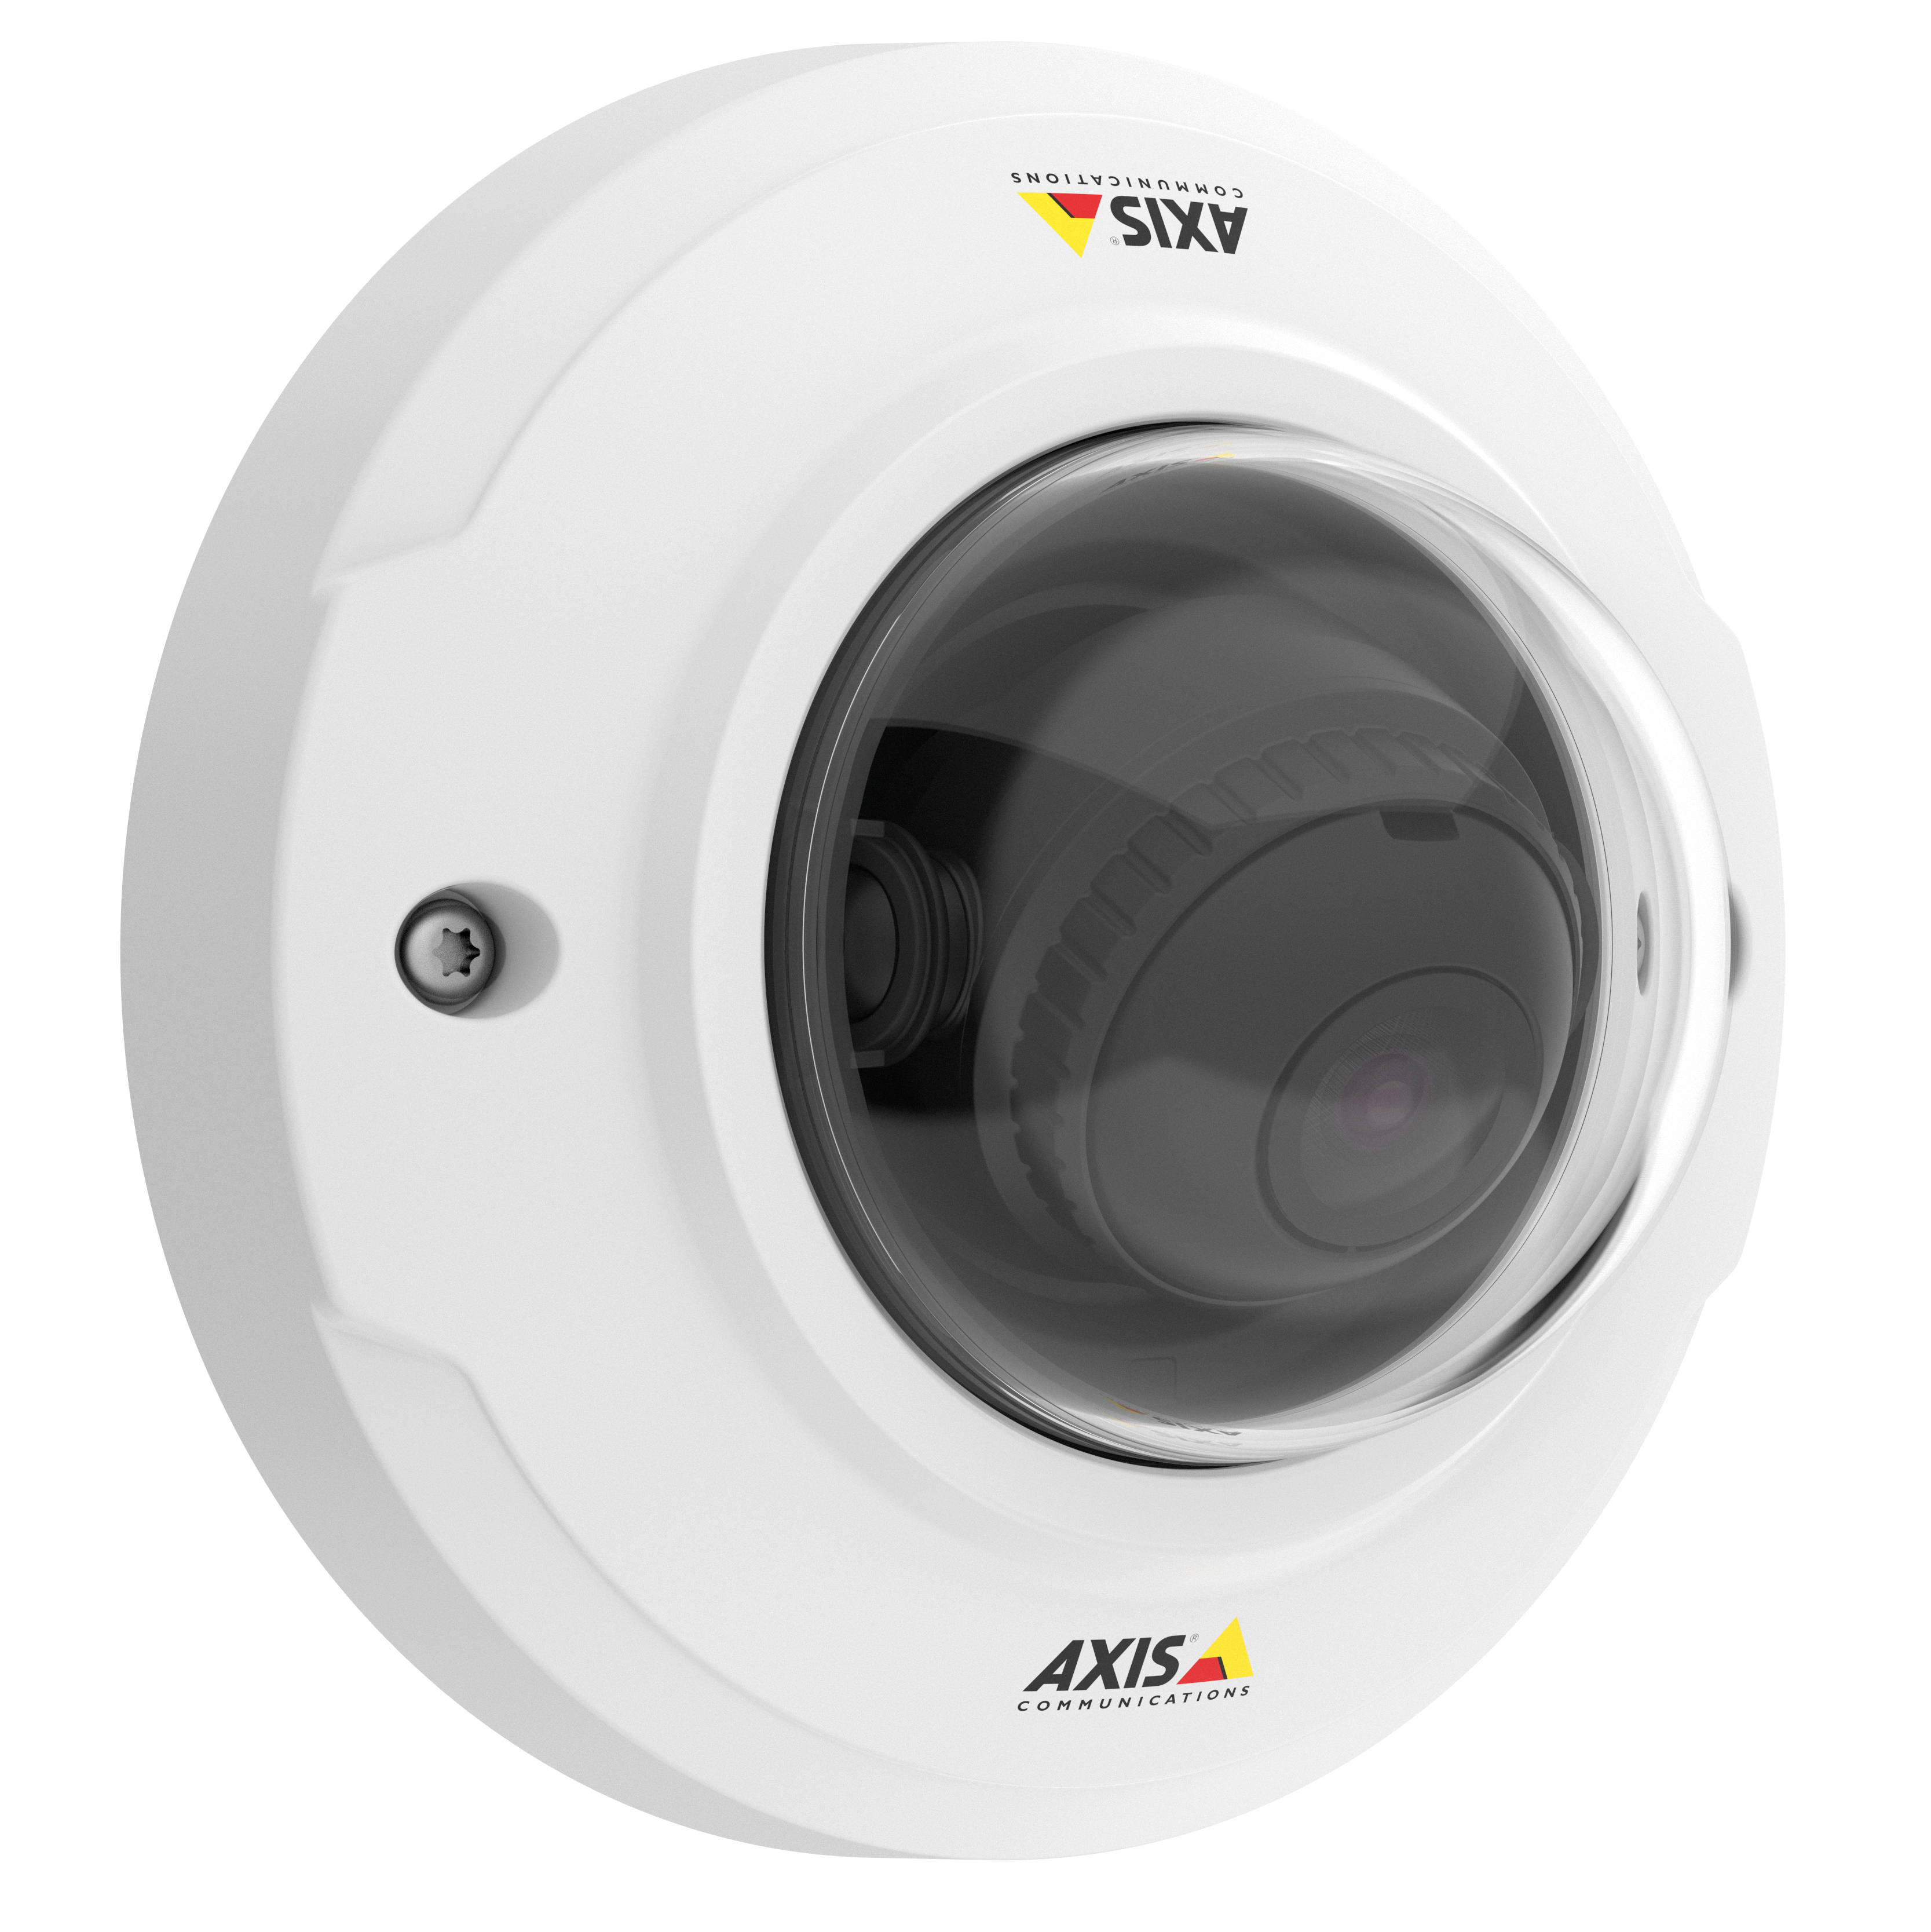 Axis M3045 Wv 2mp Wireless Dome Network Camera 0803 003